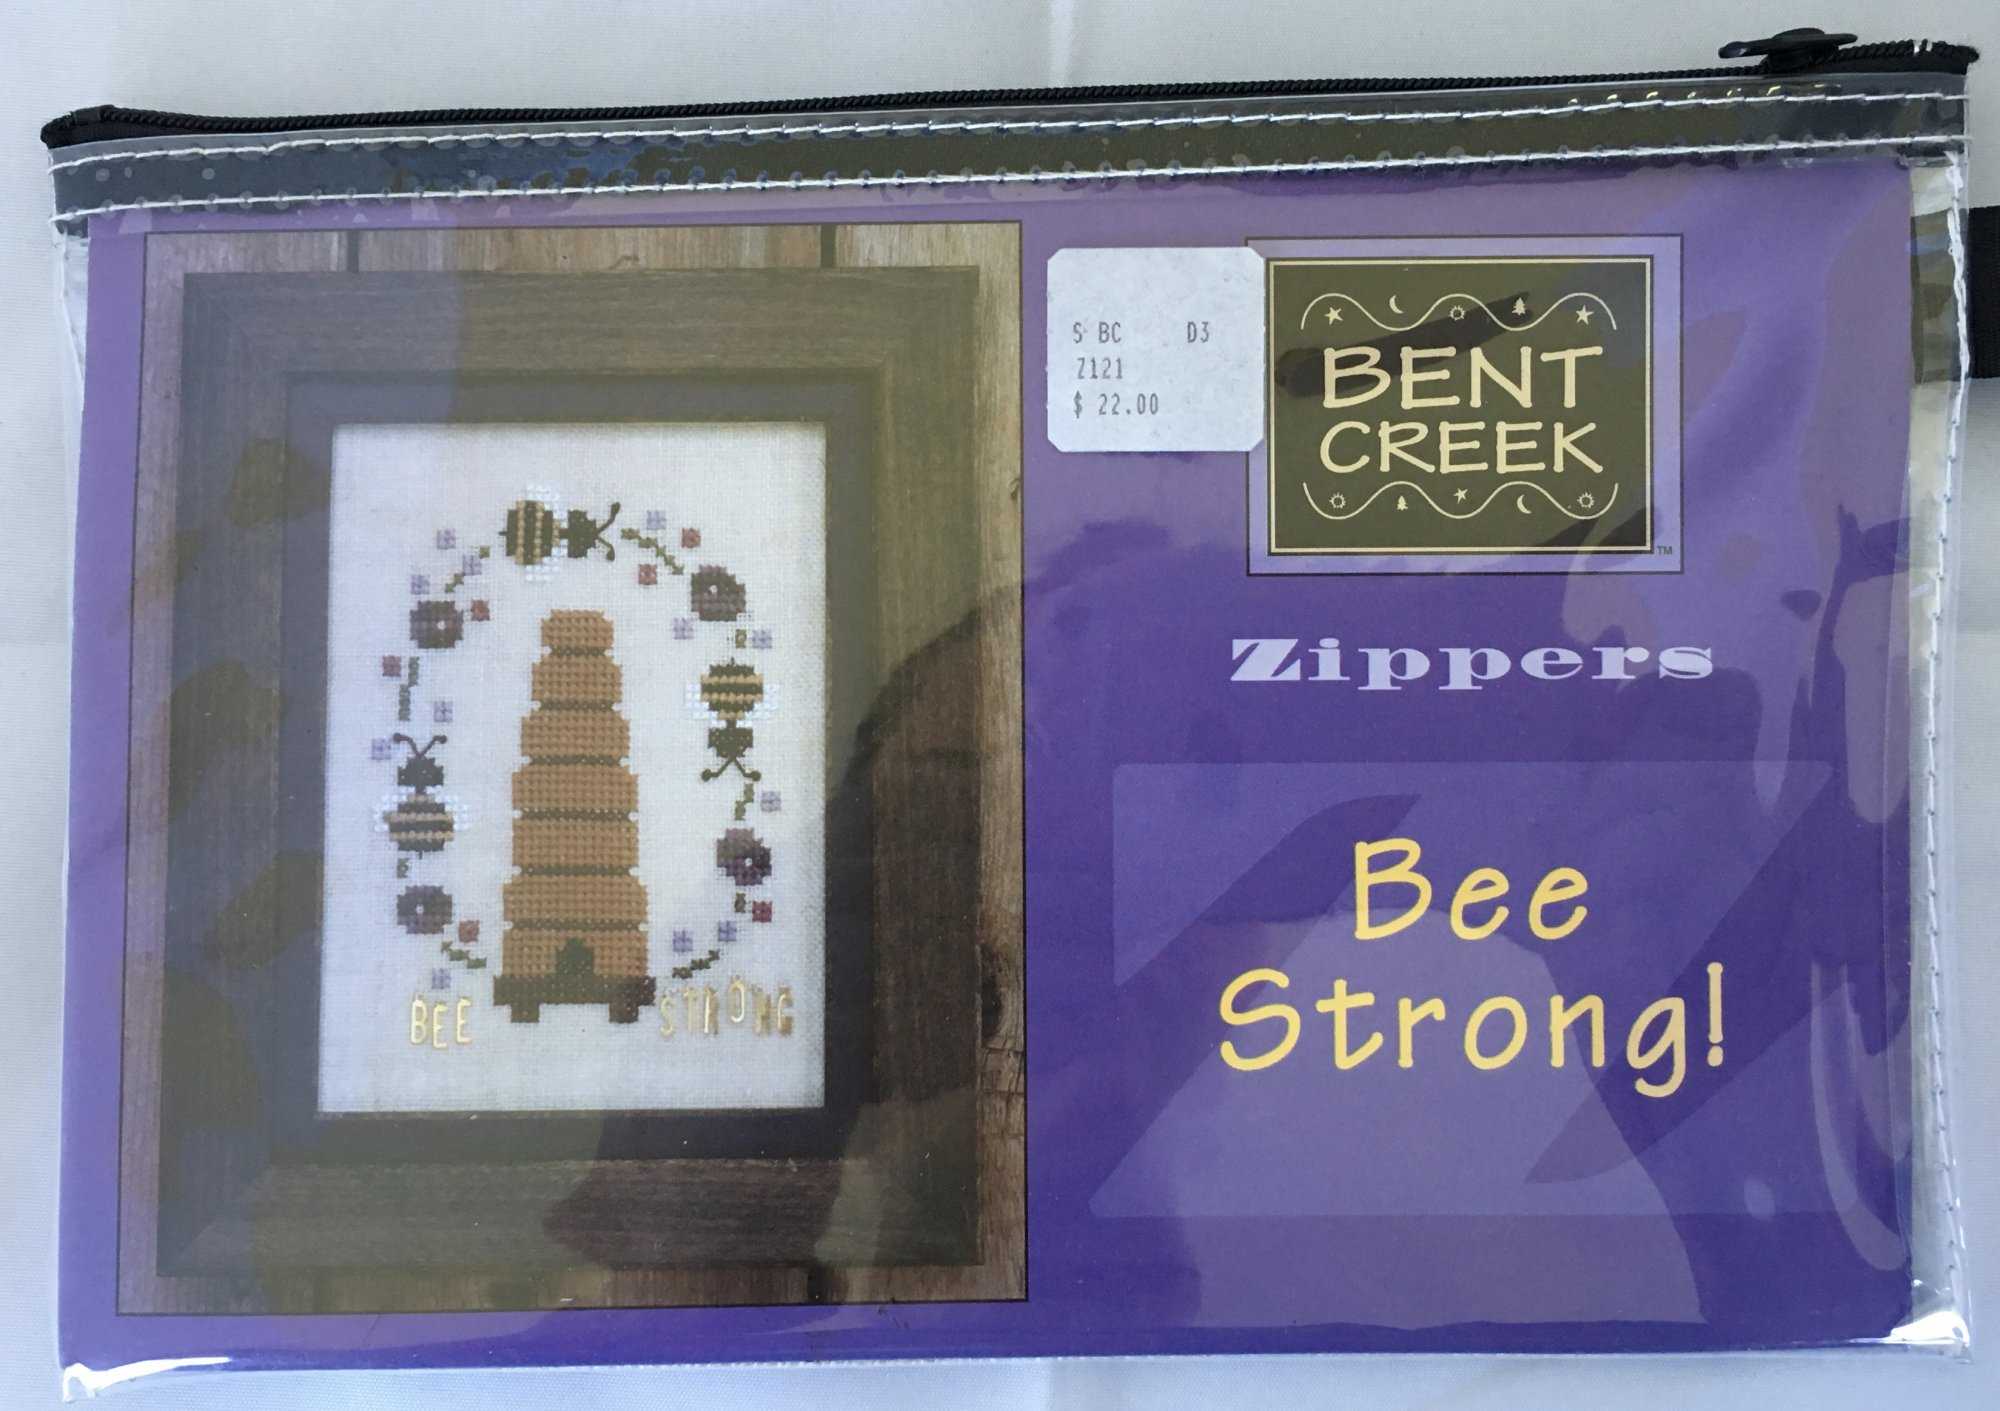 Bent Creek: Bee Strong Zipper Kit